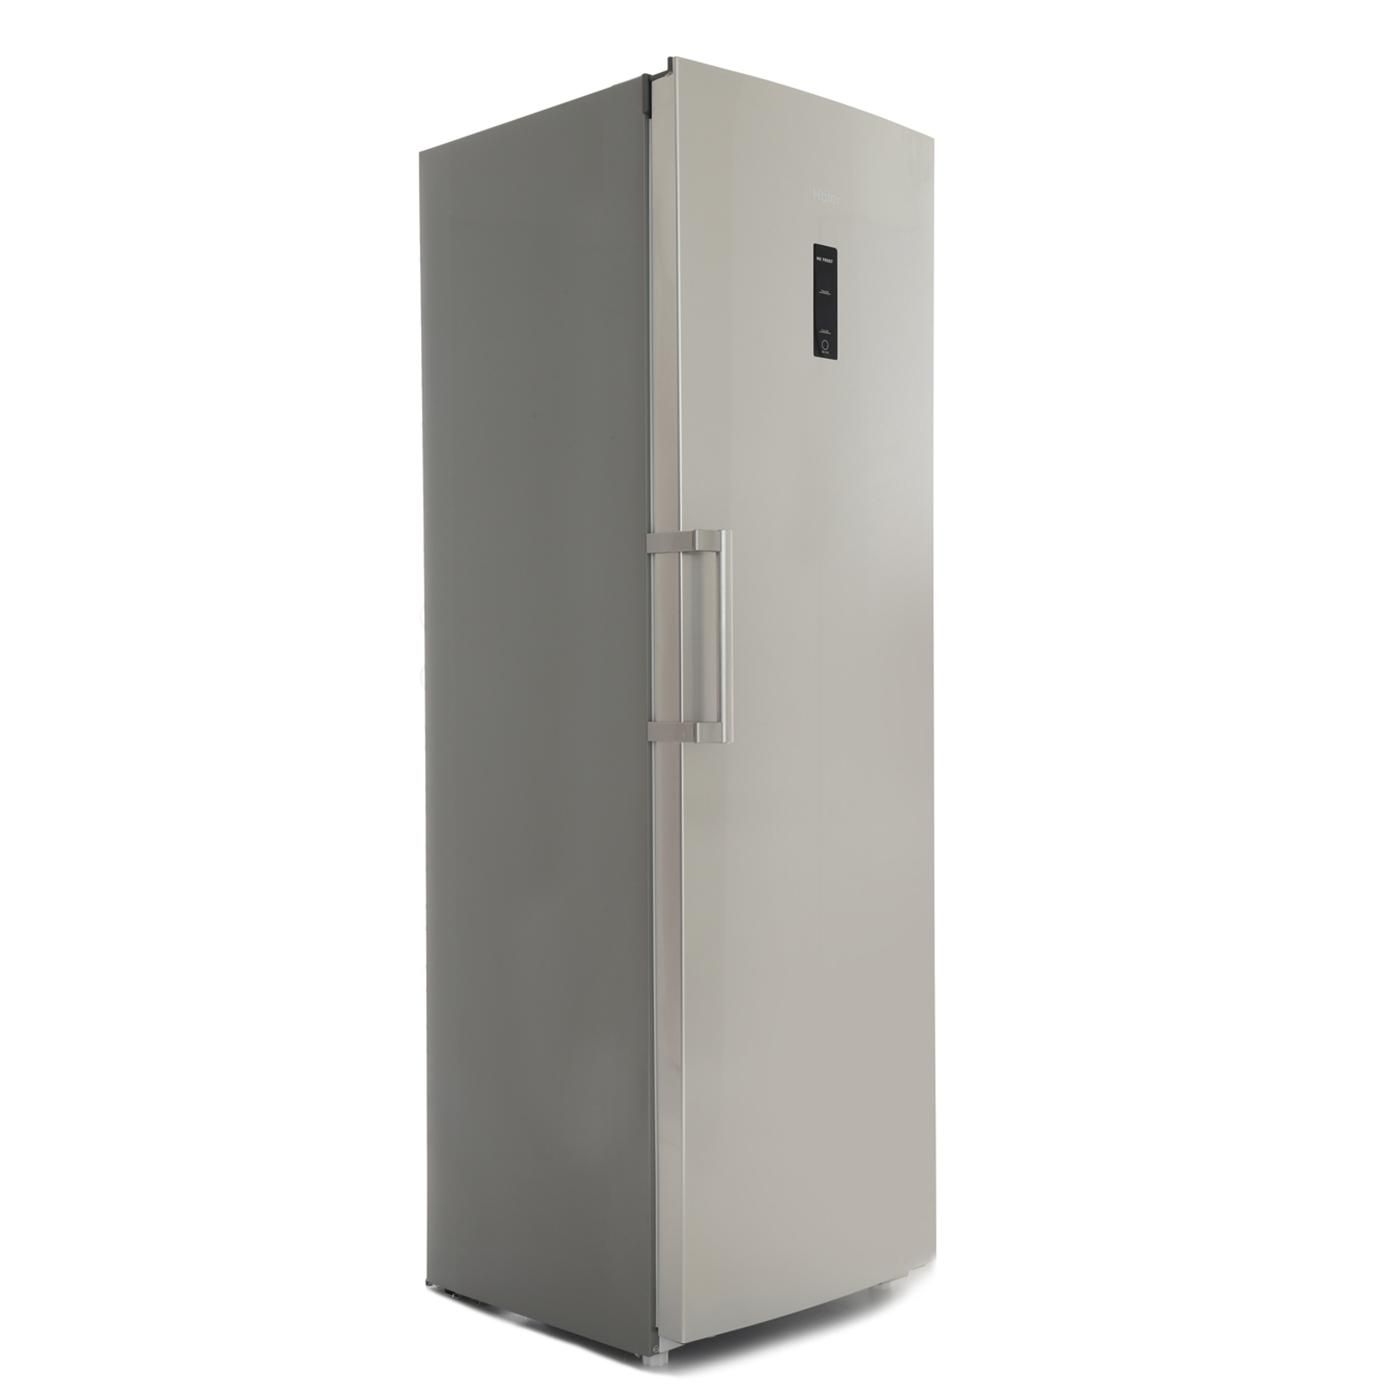 Haier HF-255FAA Tall Freezer